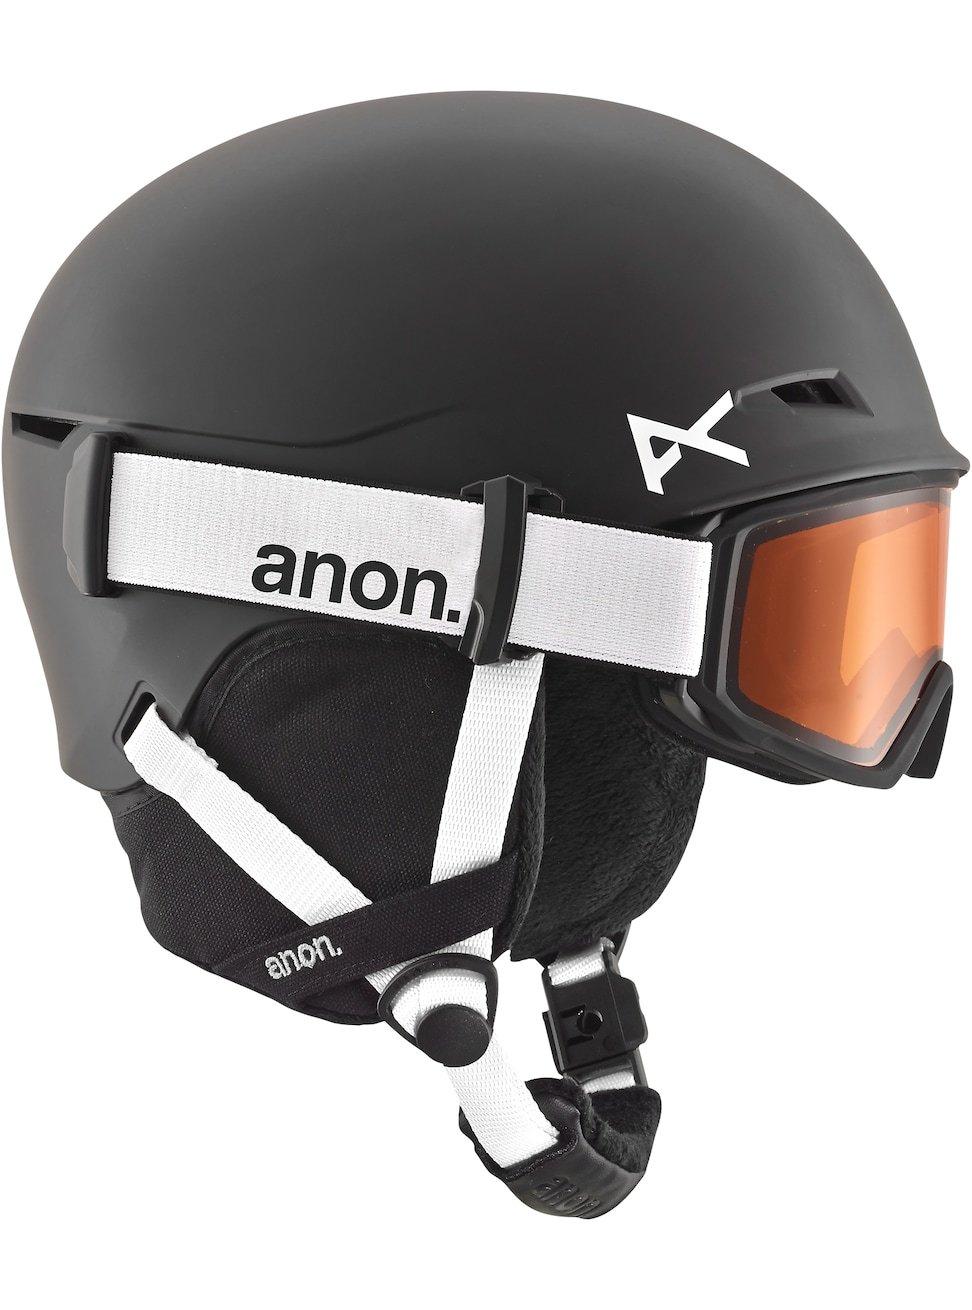 Anon Jungen Snowboardhelm Snowboardhelm Snowboardhelm Define B0155DTK66 Skihelme Bestätigungsfeedback c8d565